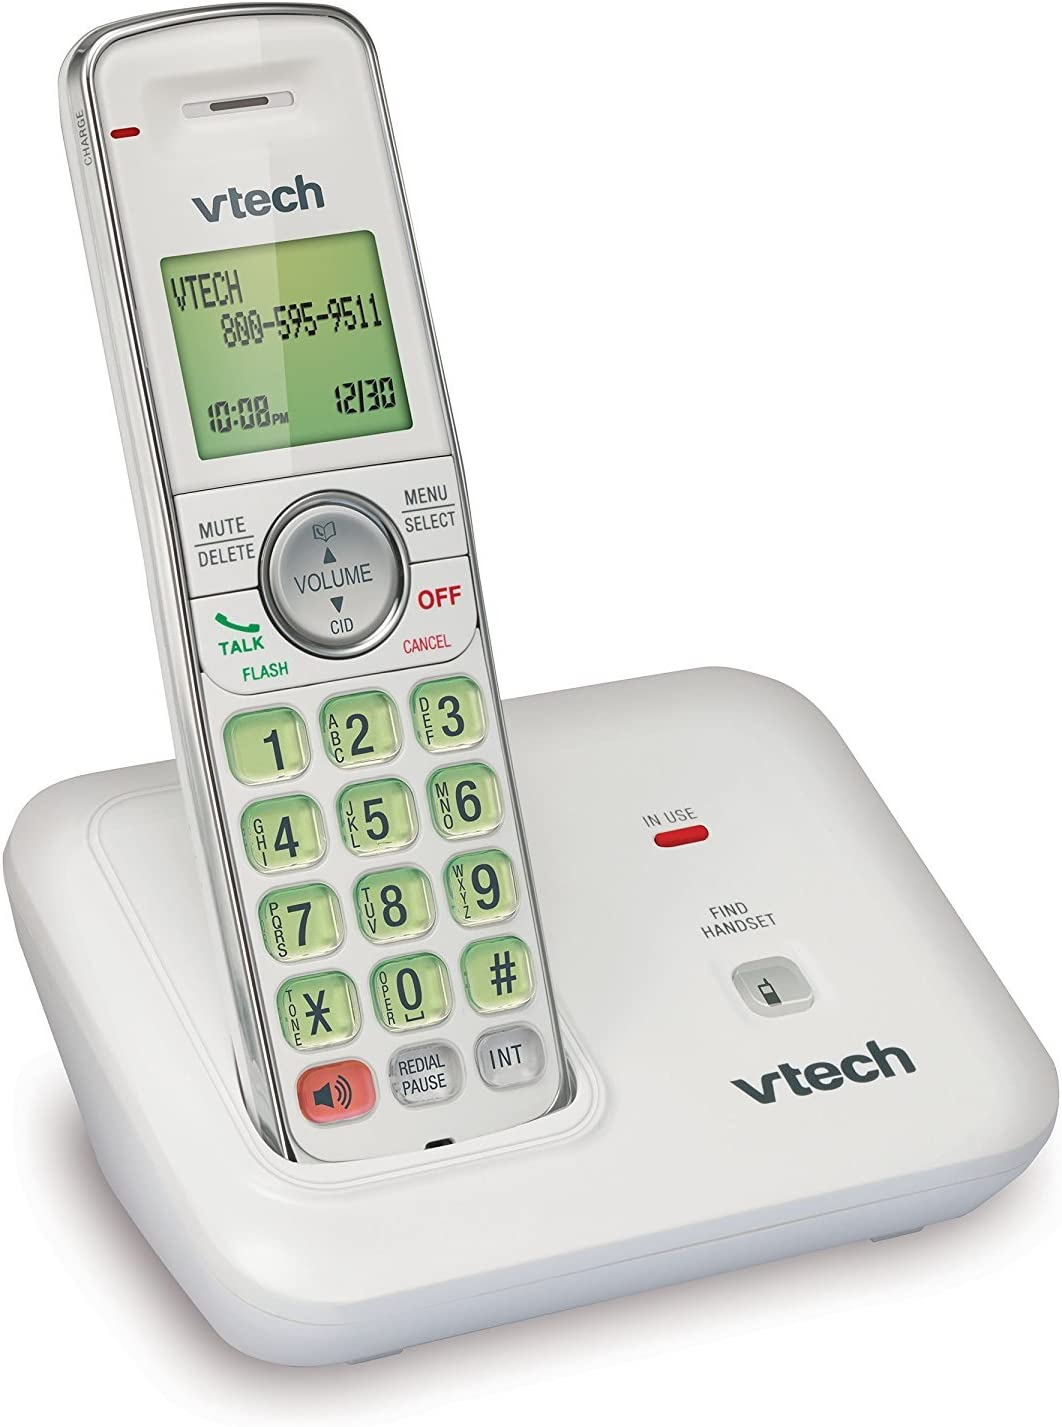 Vtech CS6419 – 17 DECT 6.0 Expandable teléfono inalámbrico con identificador de llamadas y auricular manos libres, 1 terminal, color blanco: Amazon.es: Electrónica